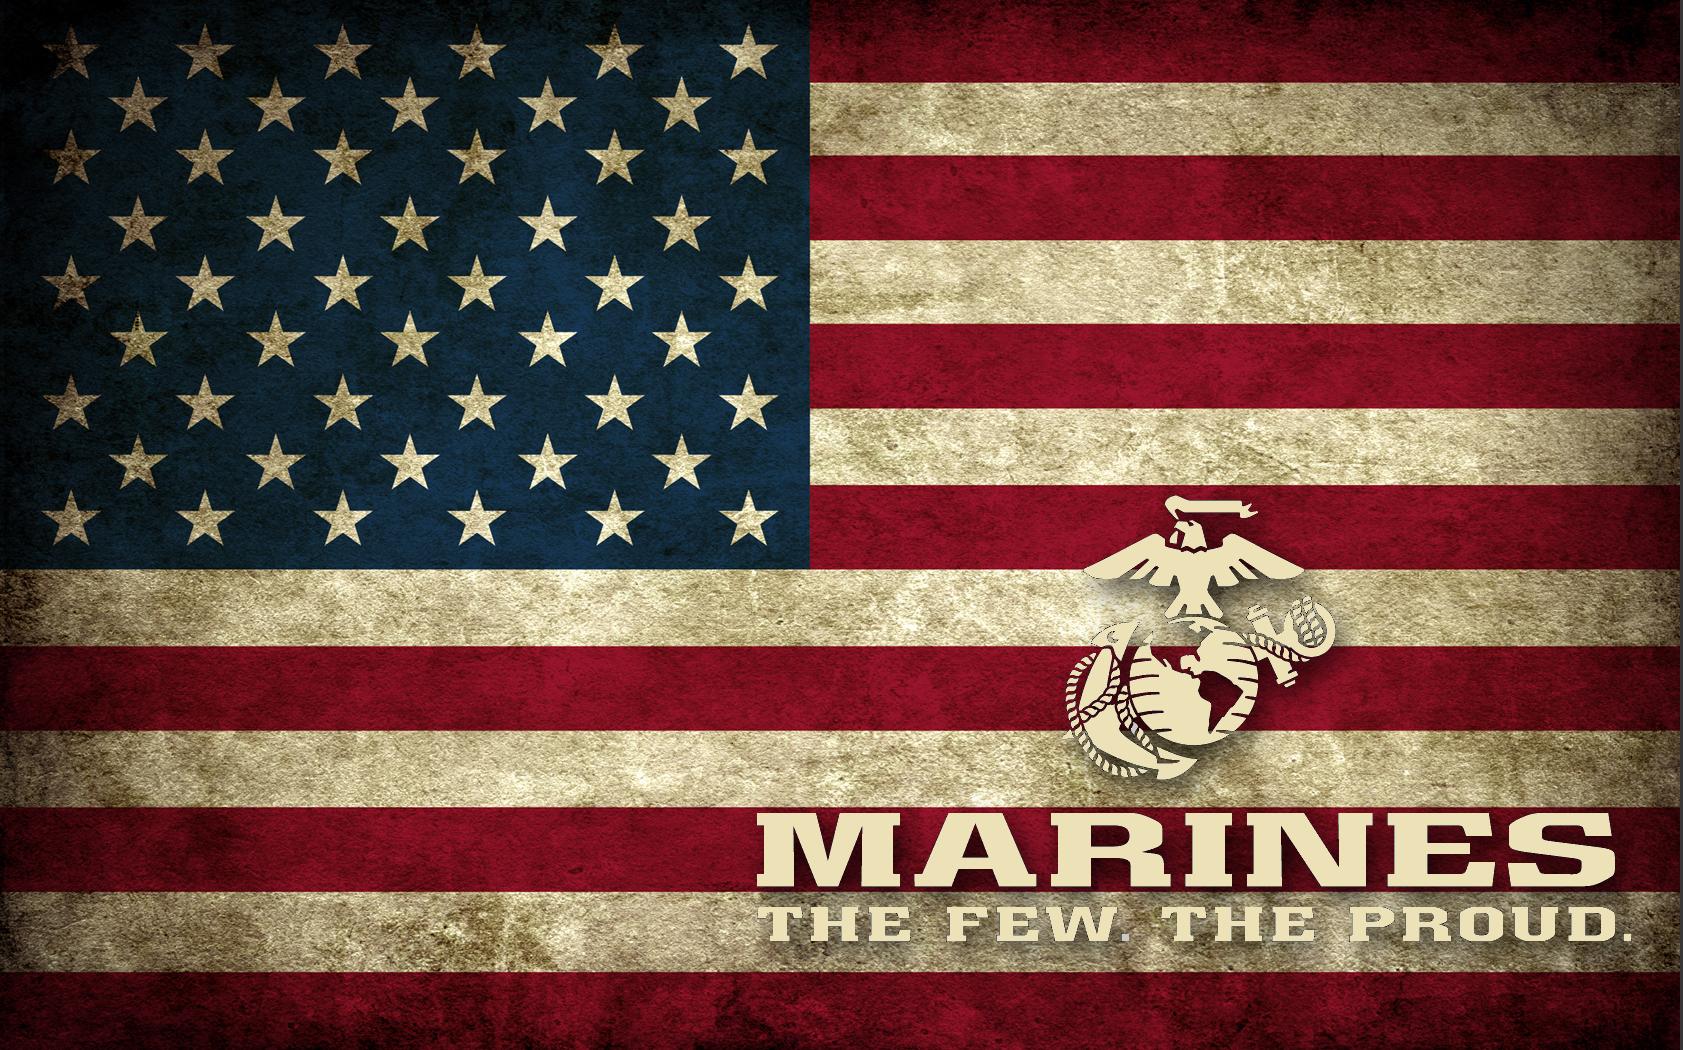 Marine Corps Desktop Wallpaper loopelecom 1683x1050